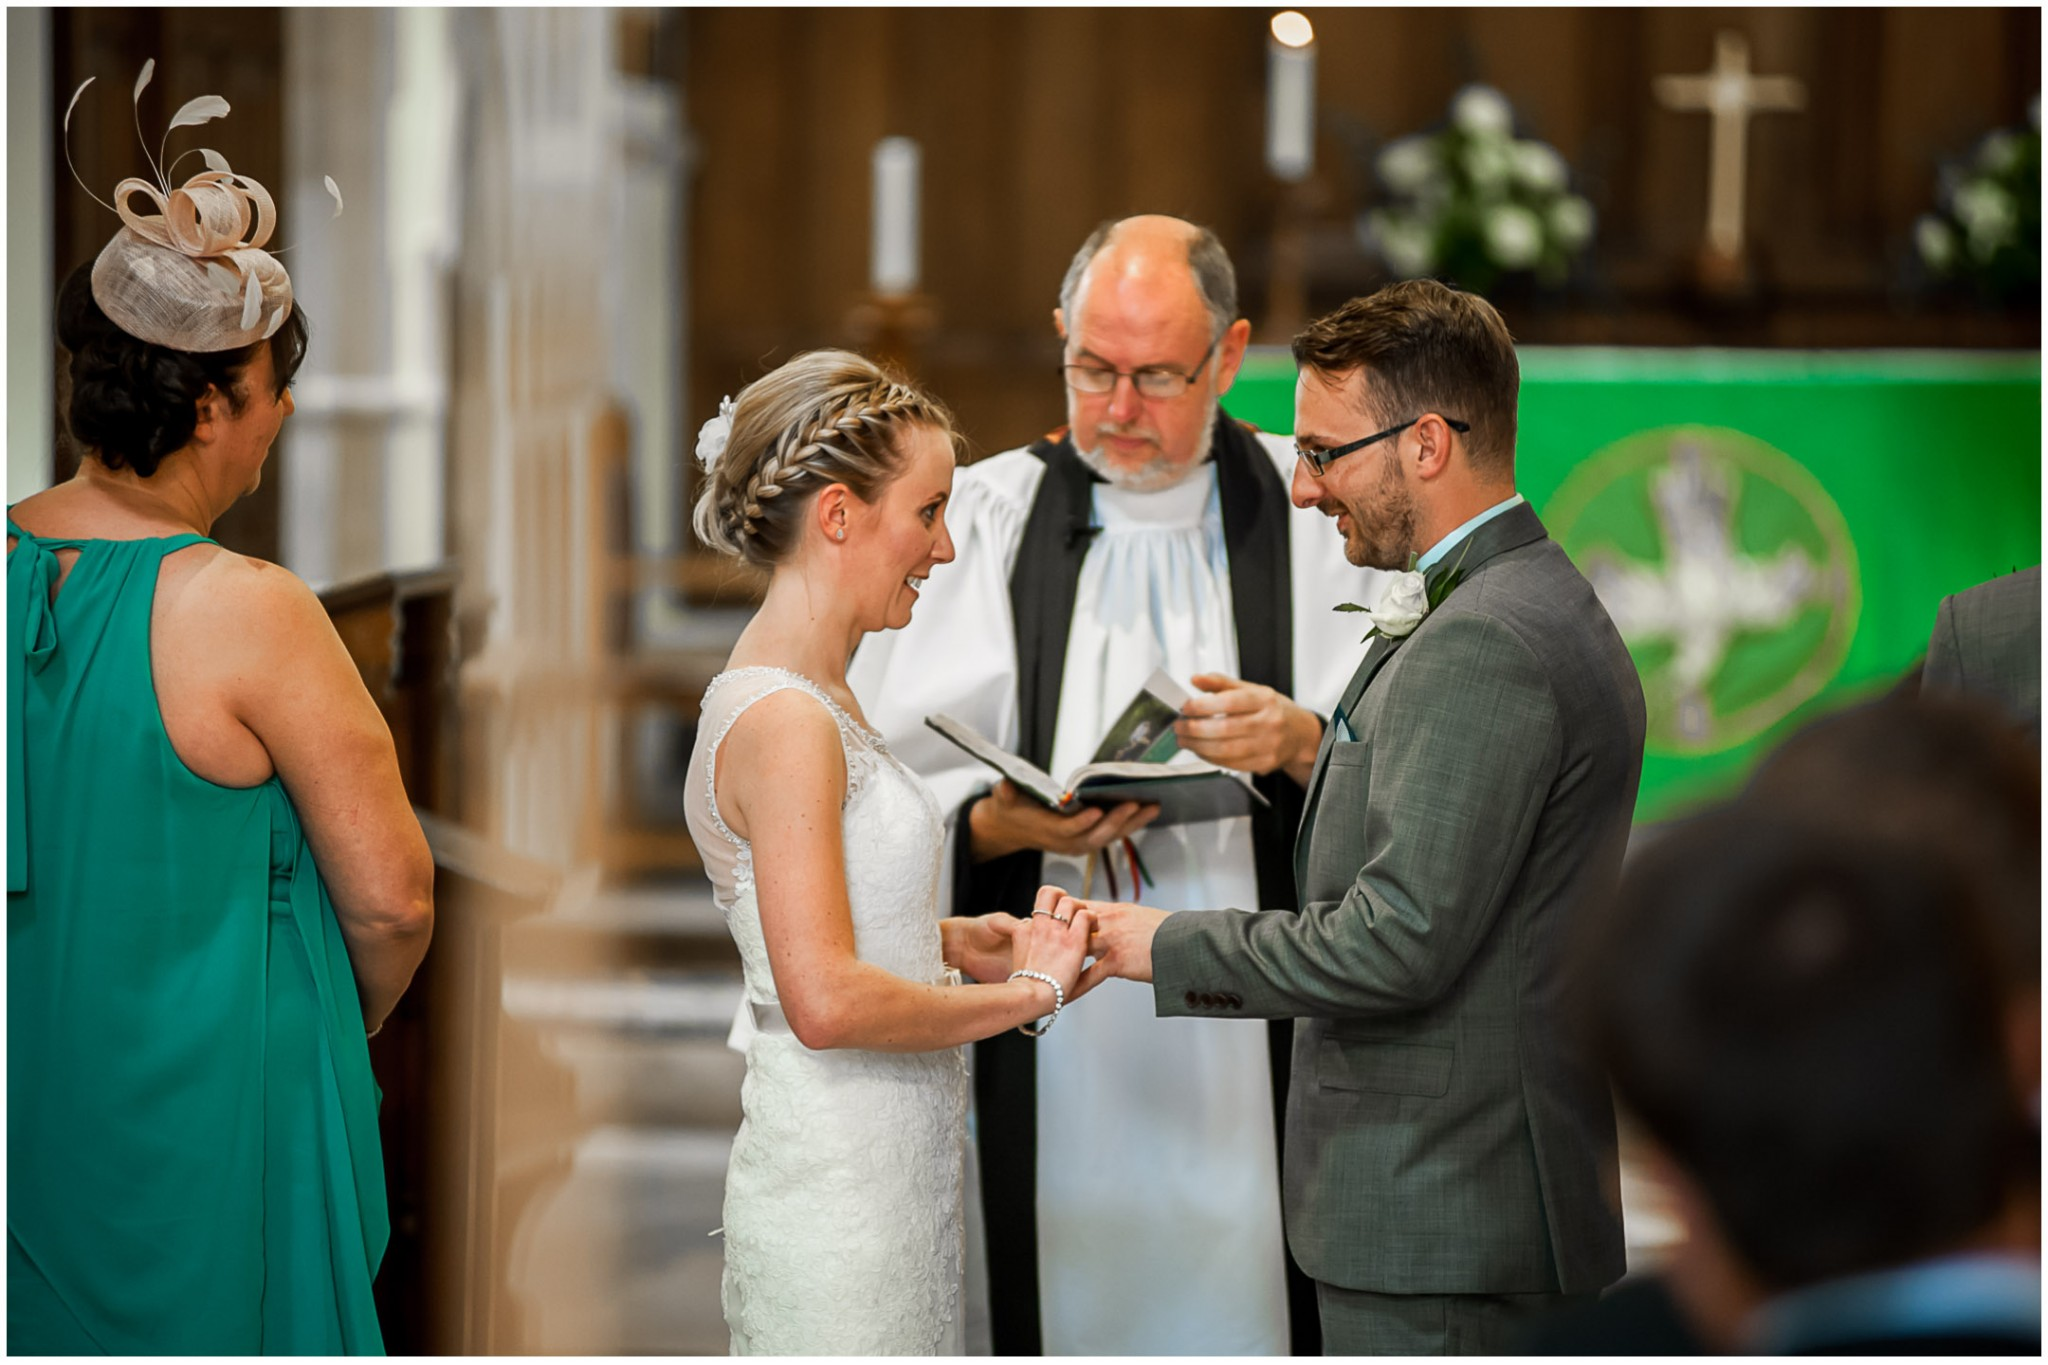 St Thomas a Becket Church Wedding Exchanging rings